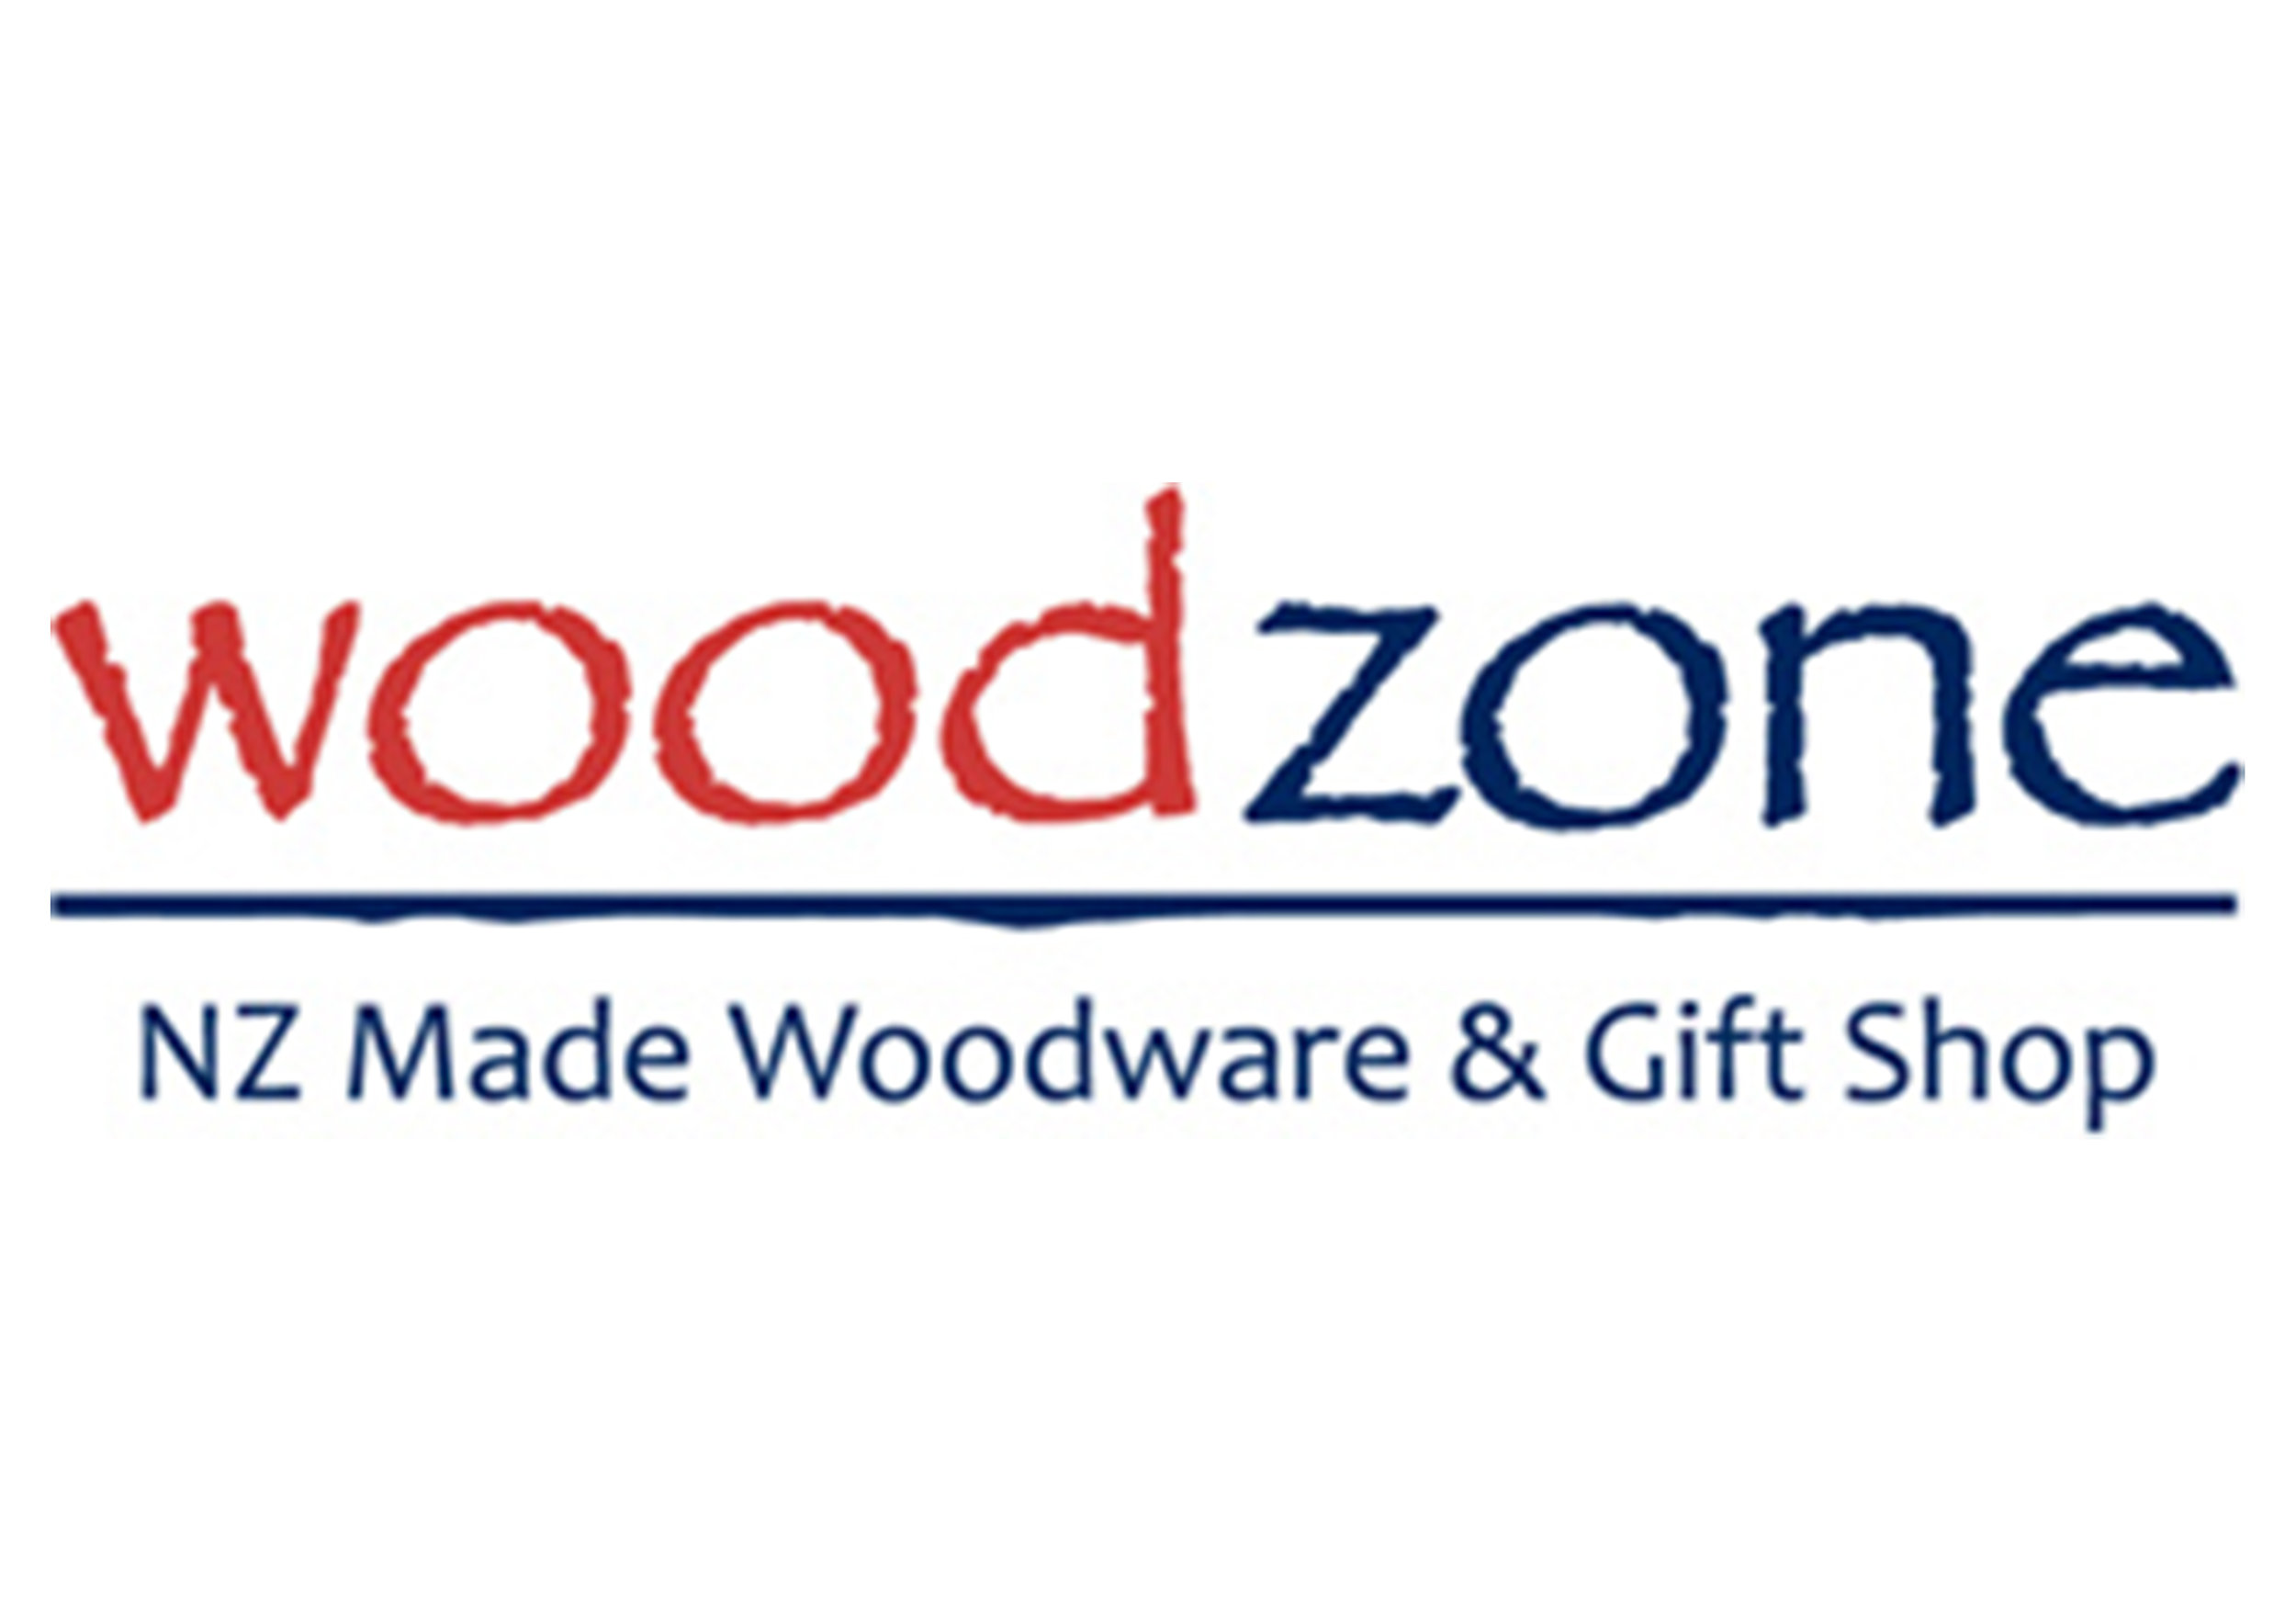 woodzone.jpg